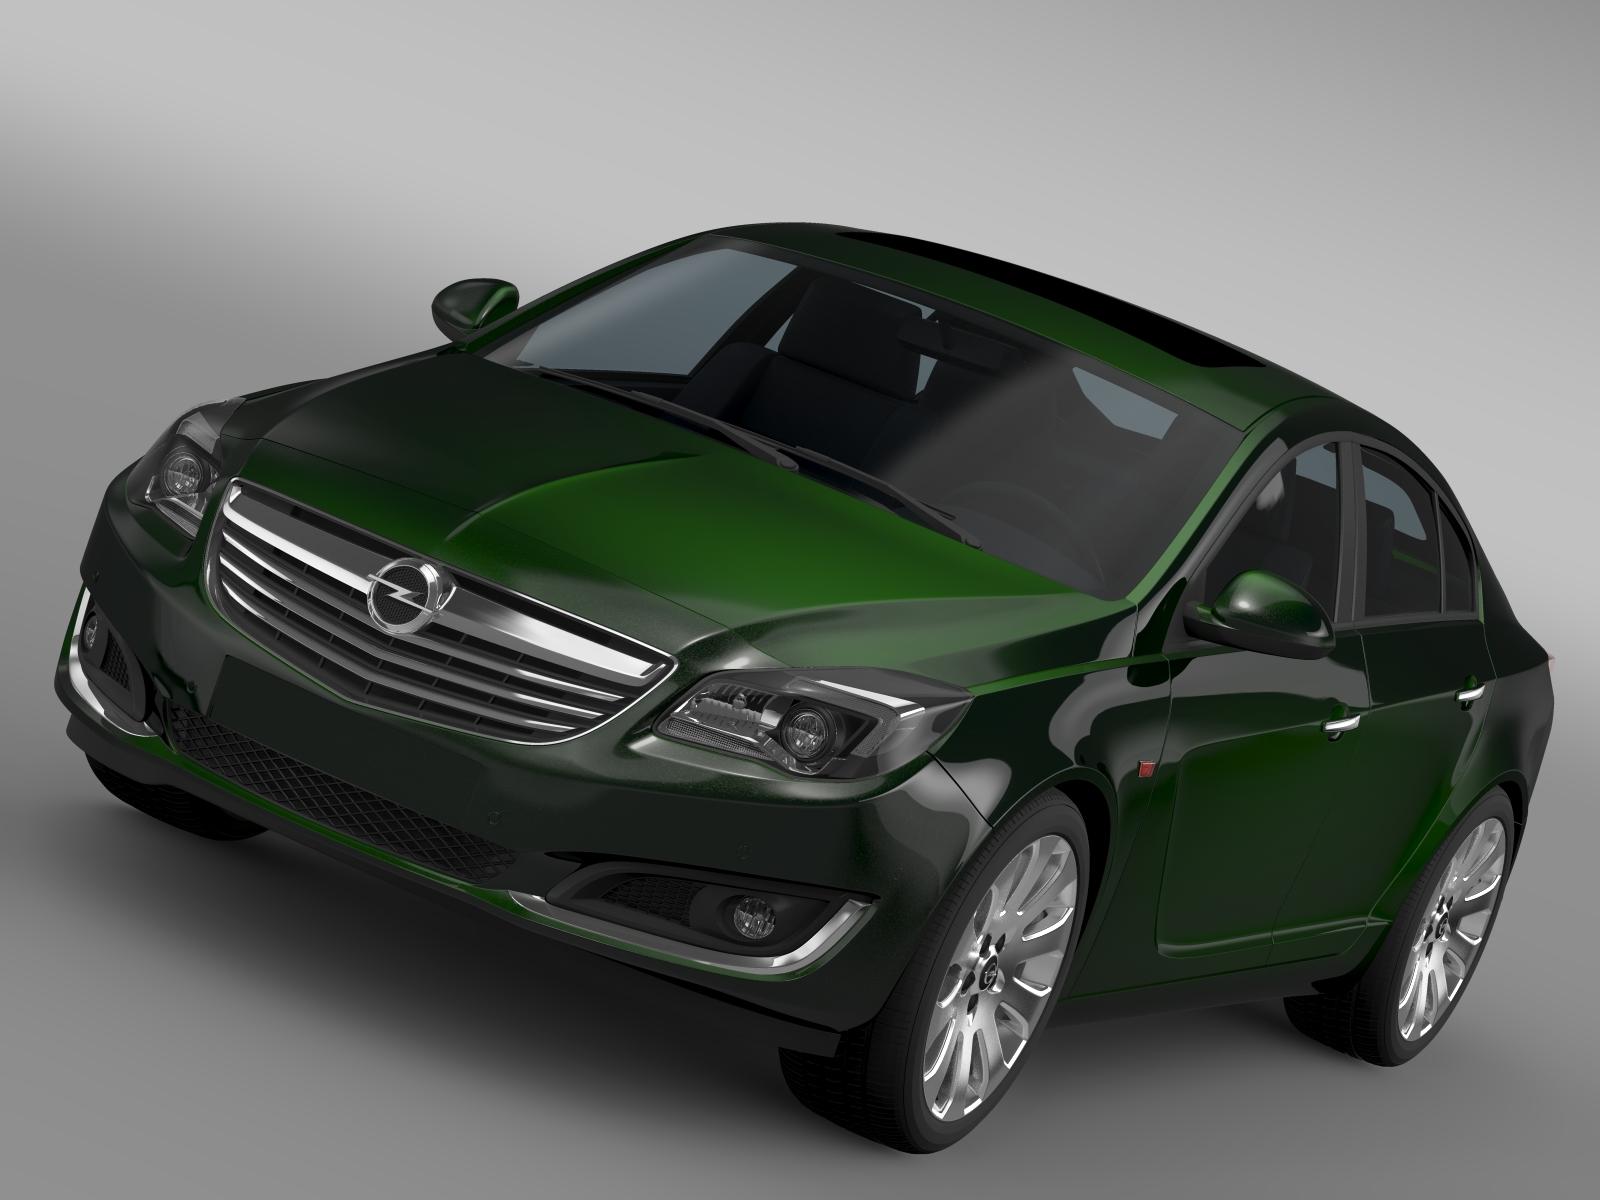 opel insignia hatchback 2015 3d model 3ds max fbx c4d lwo ma mb hrc xsi obj 215275